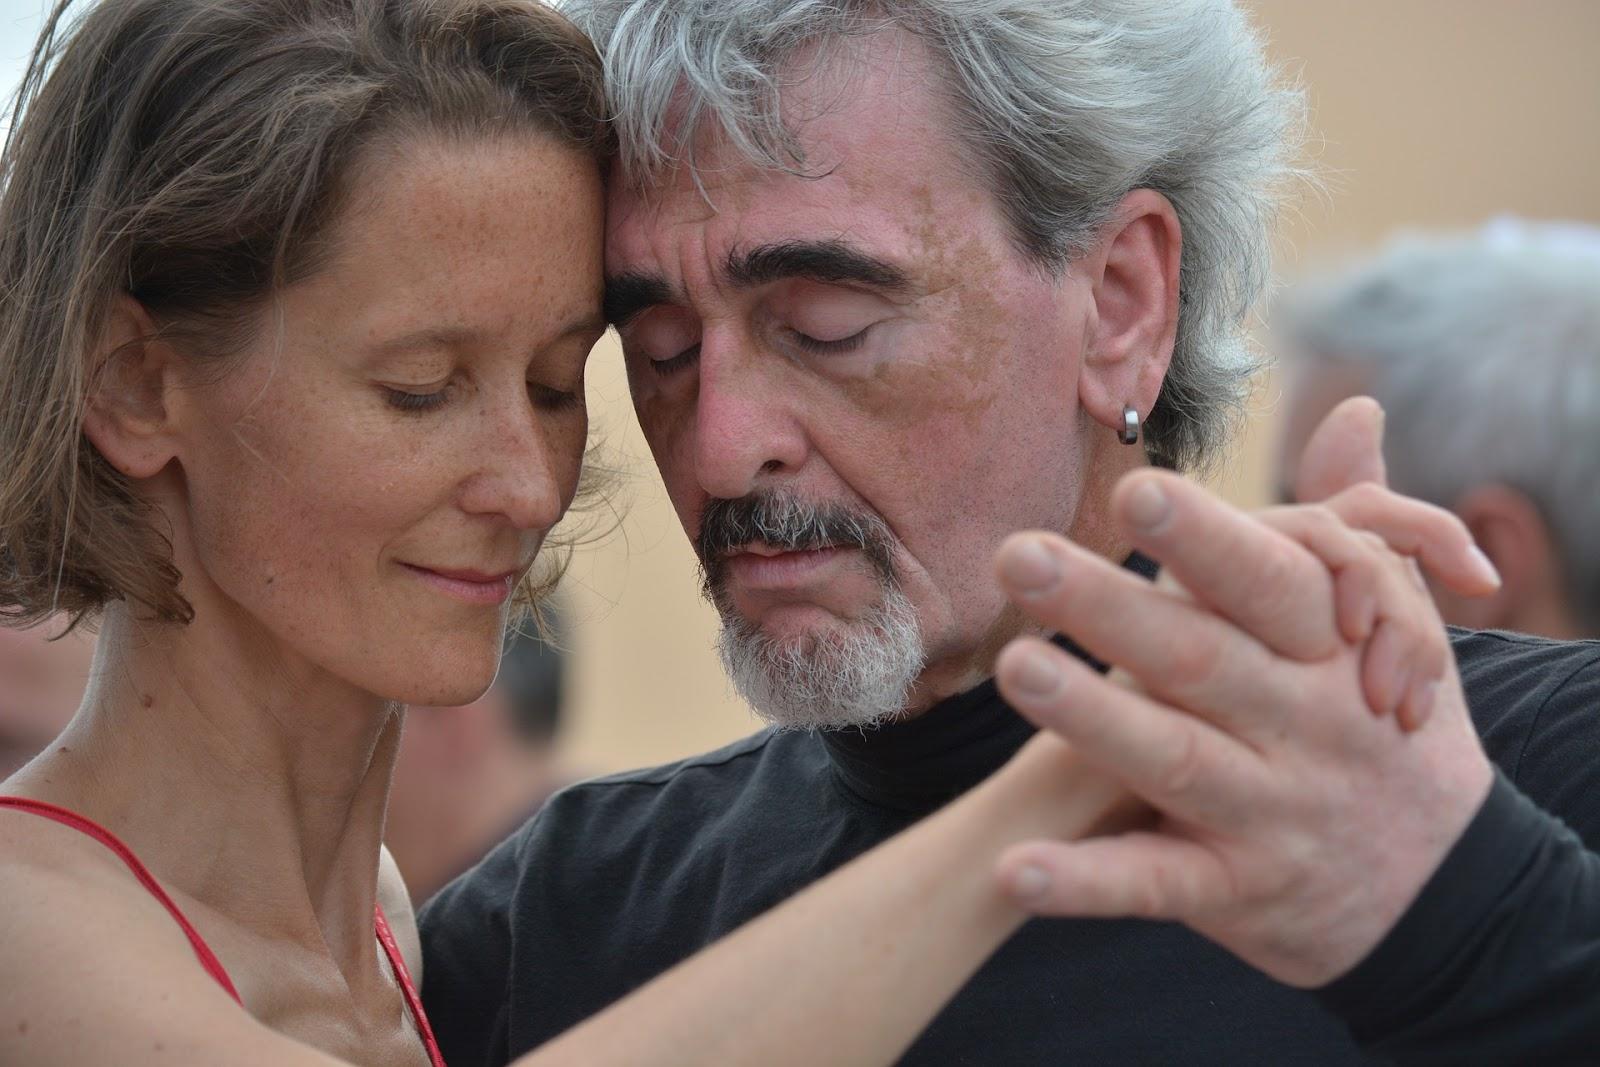 couple dancing togethe